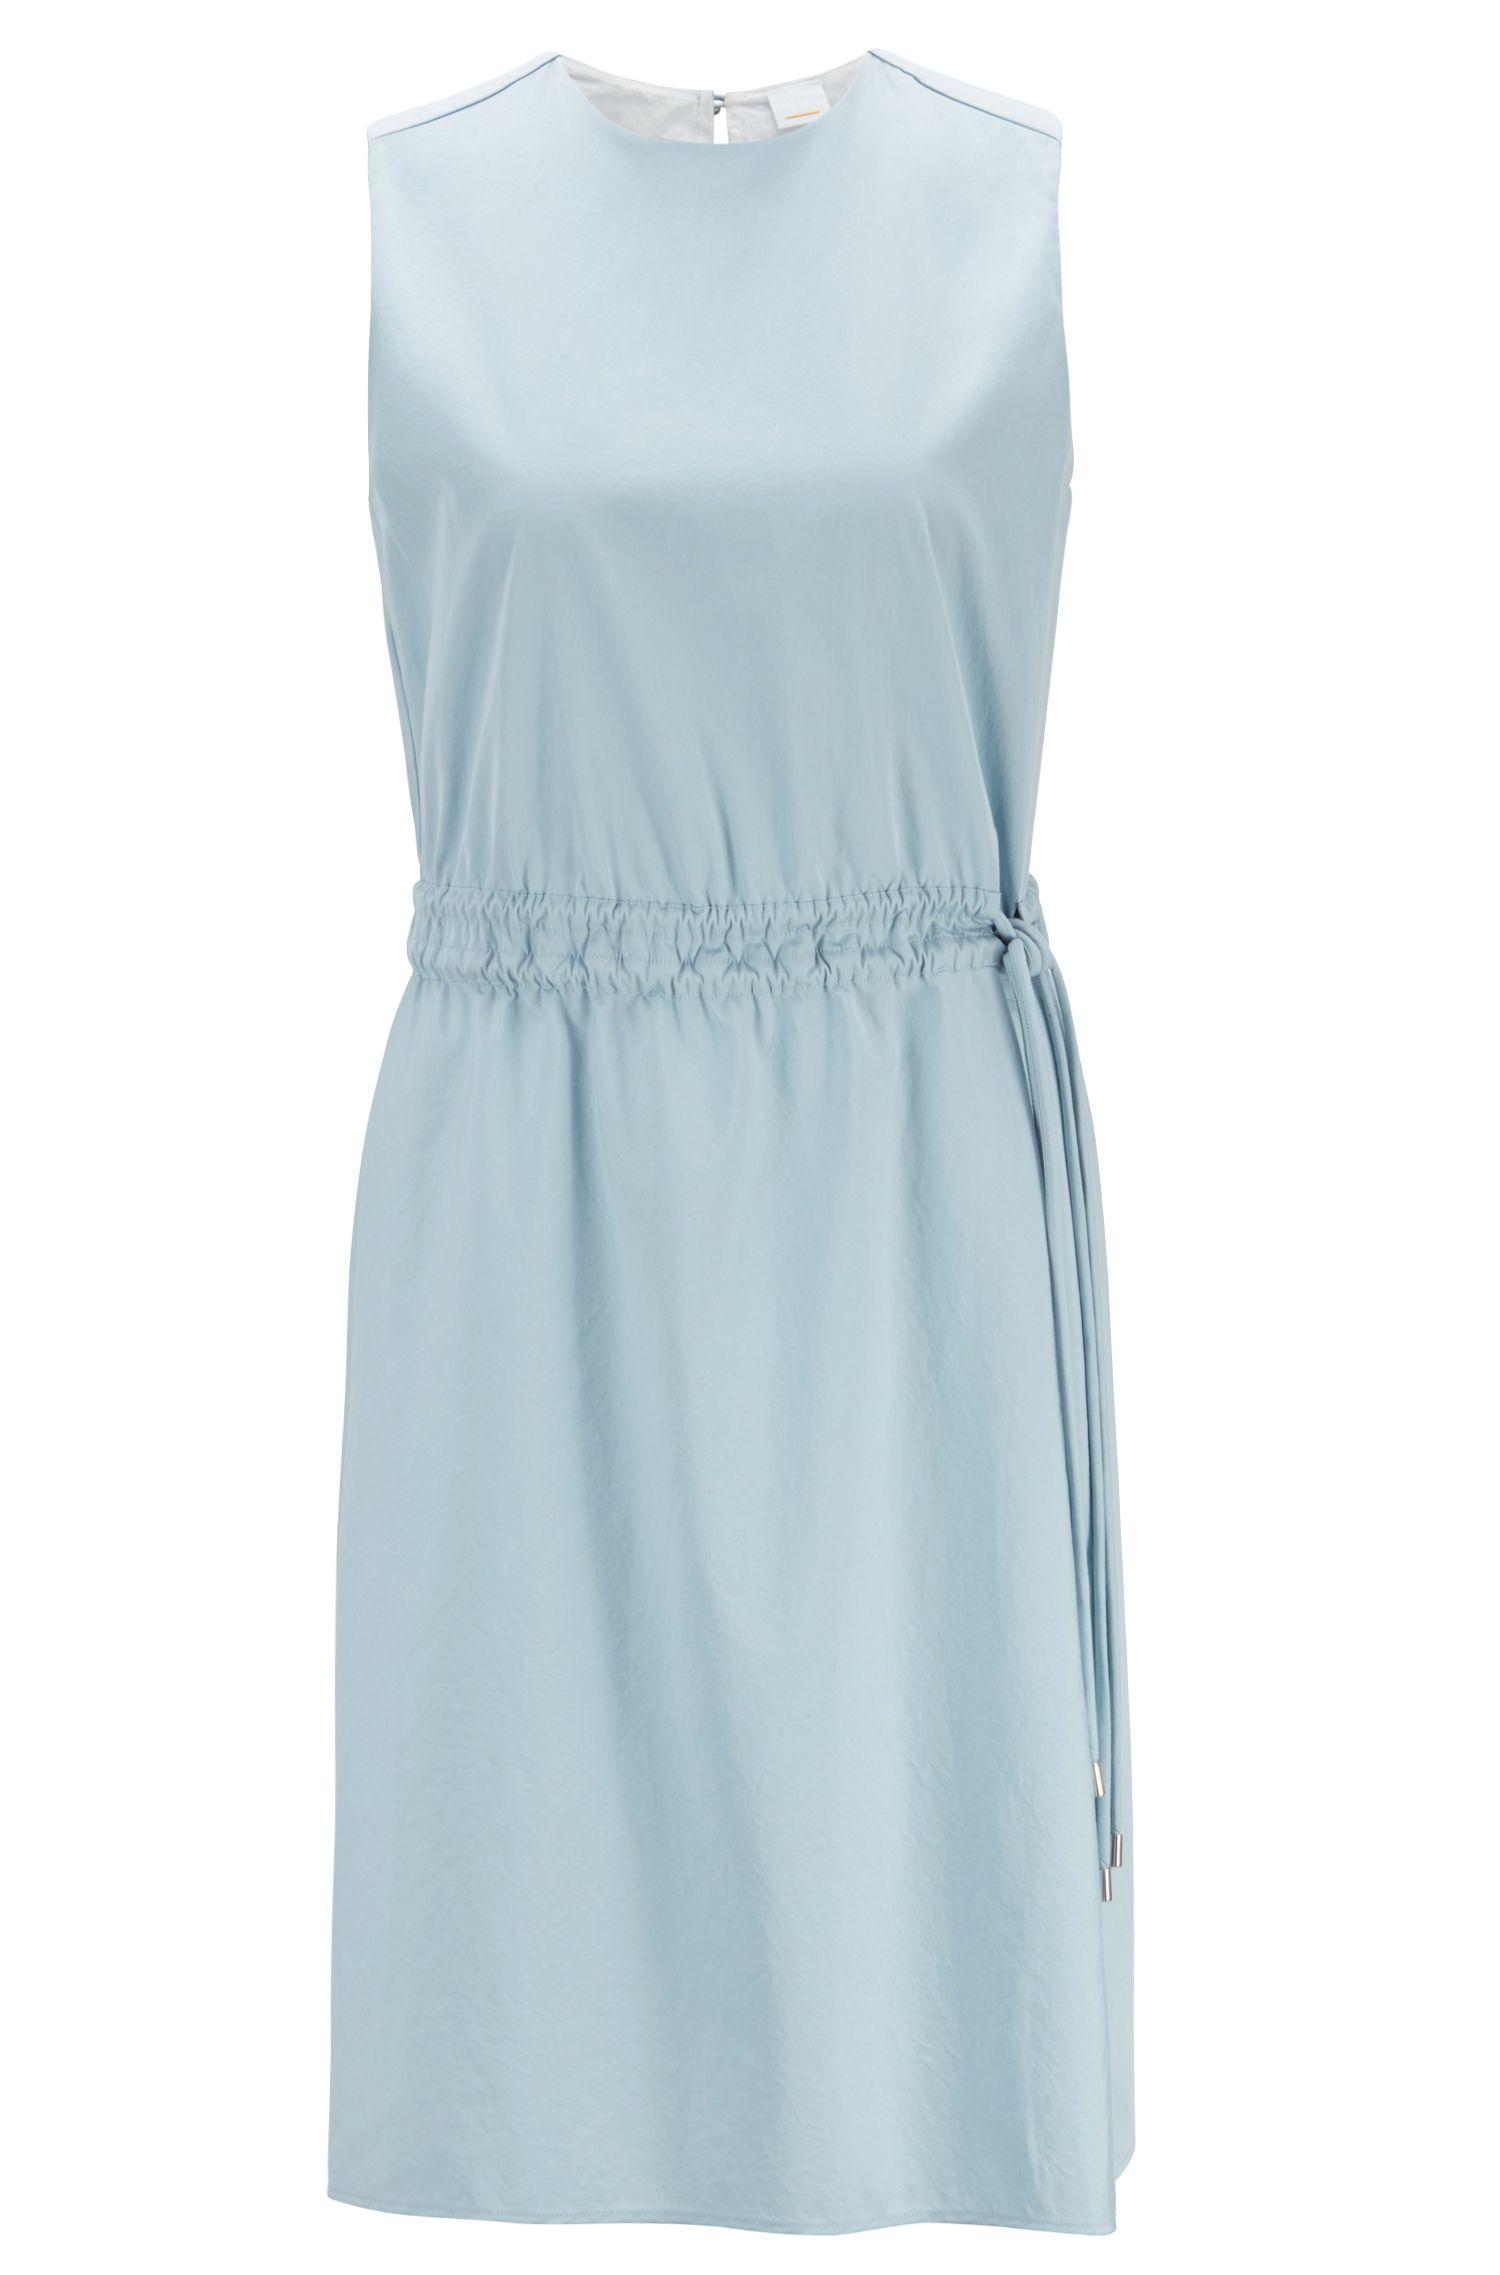 Ärmelloses Kleid aus Baumwoll-Popeline mit verstellbarer Taille, Hellblau